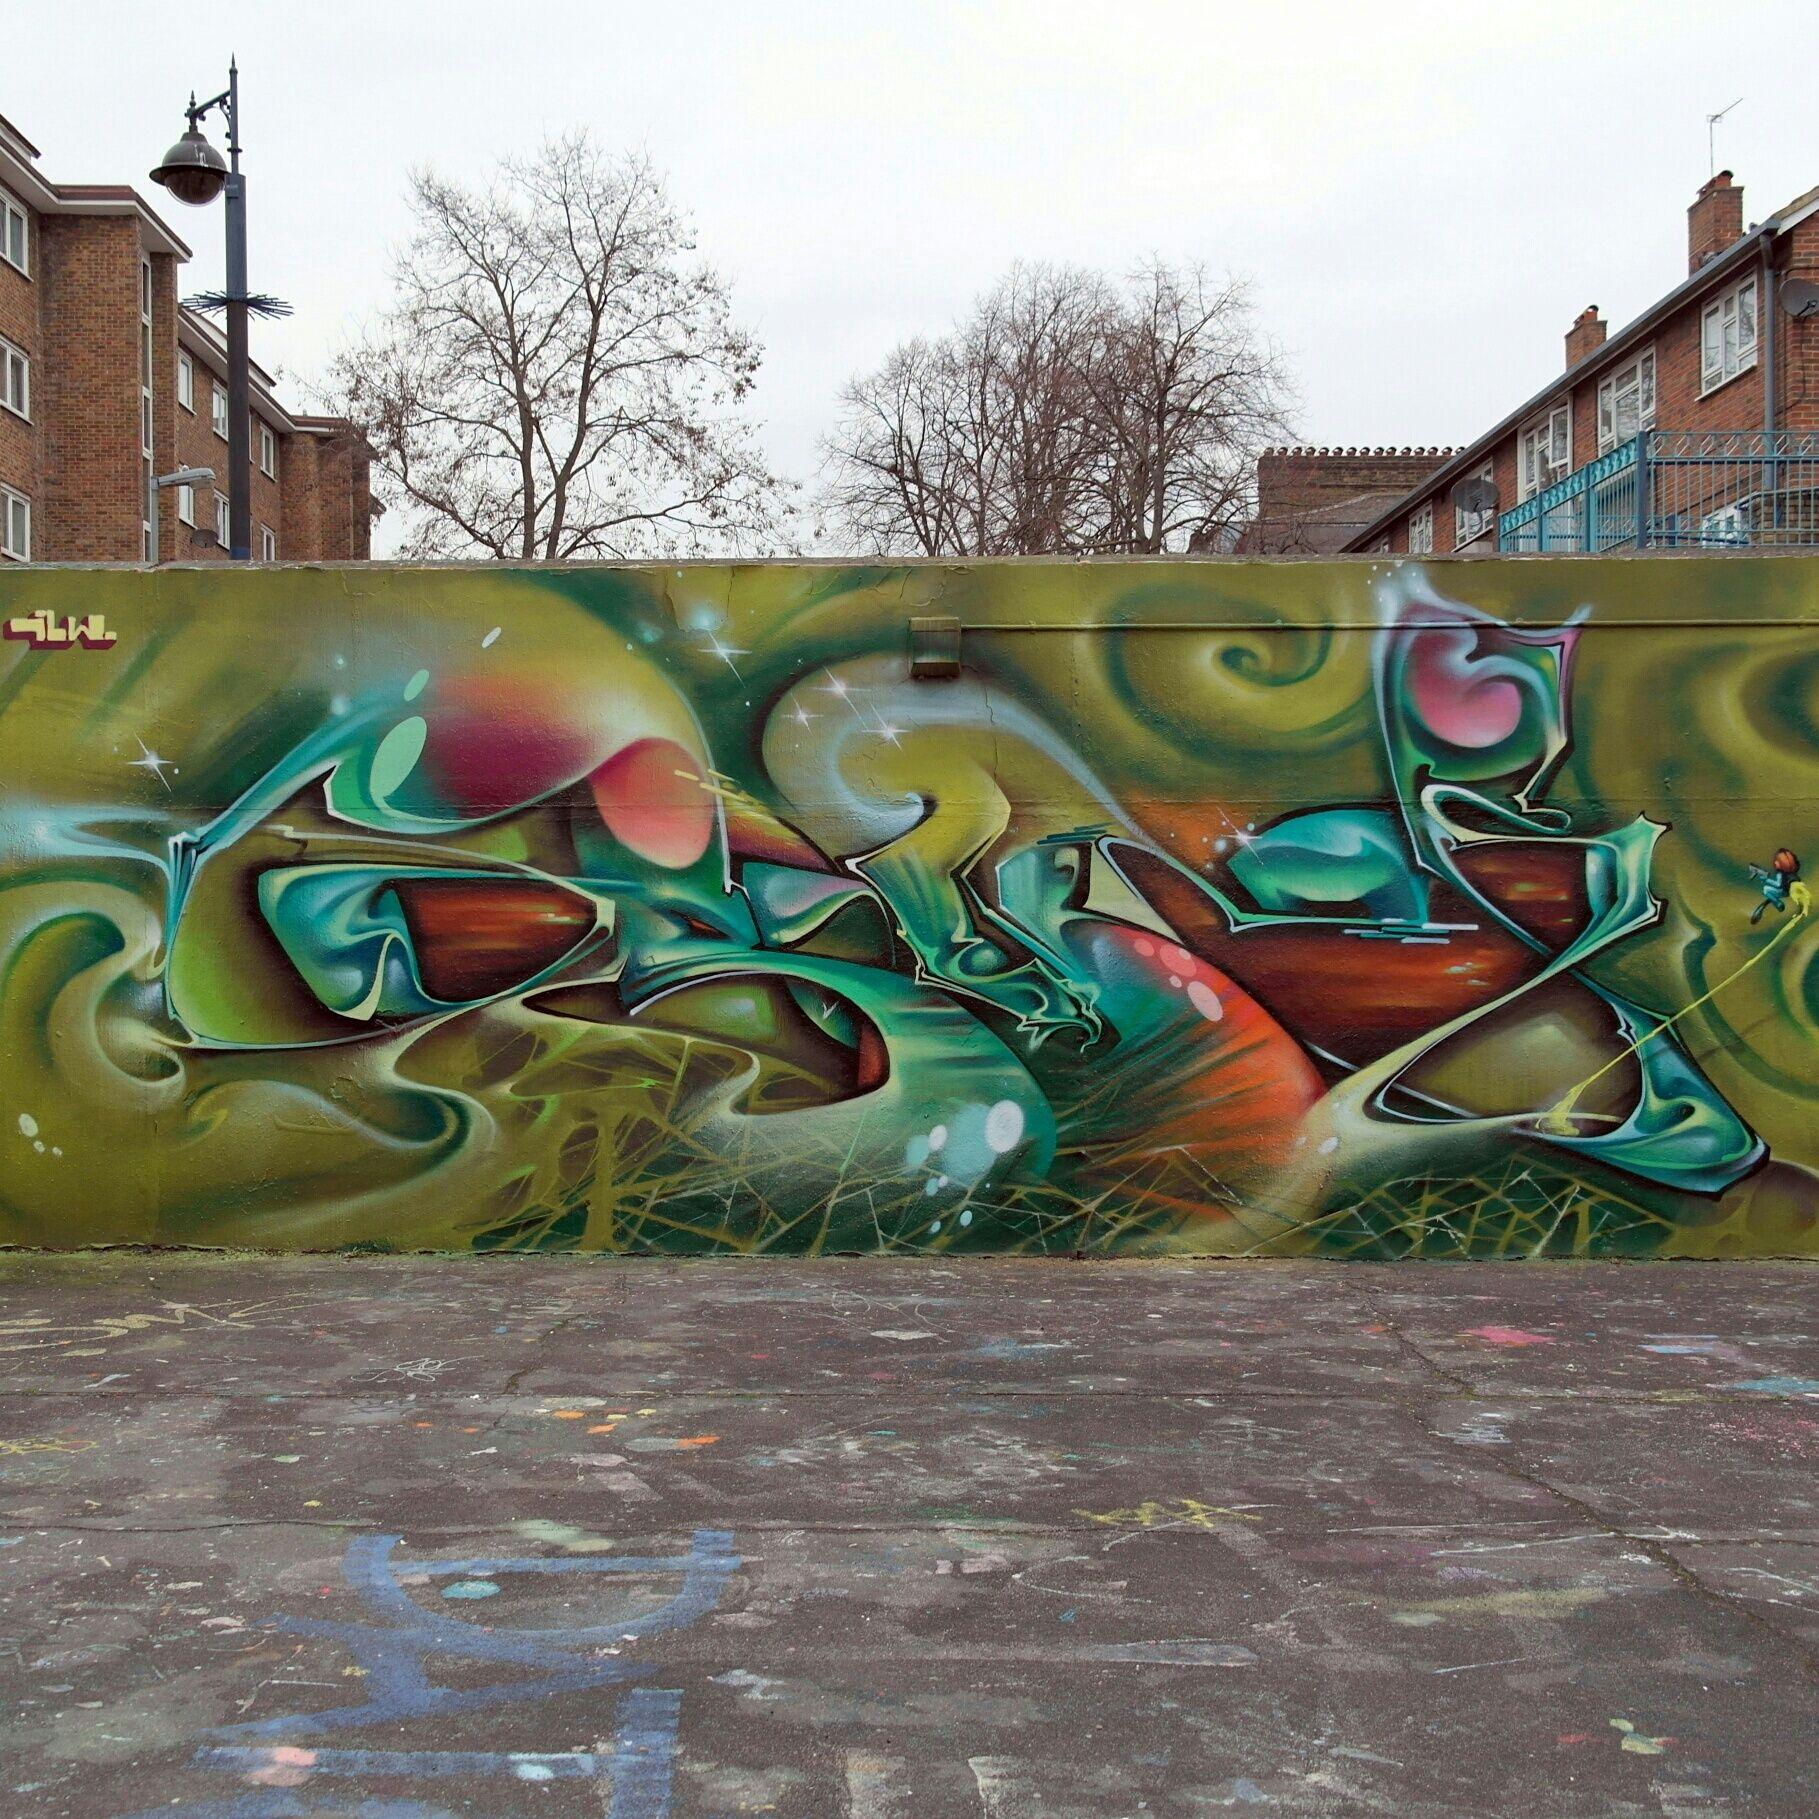 Pin By Jan Taylor On Murals Pinterest Street Art Graffiti And